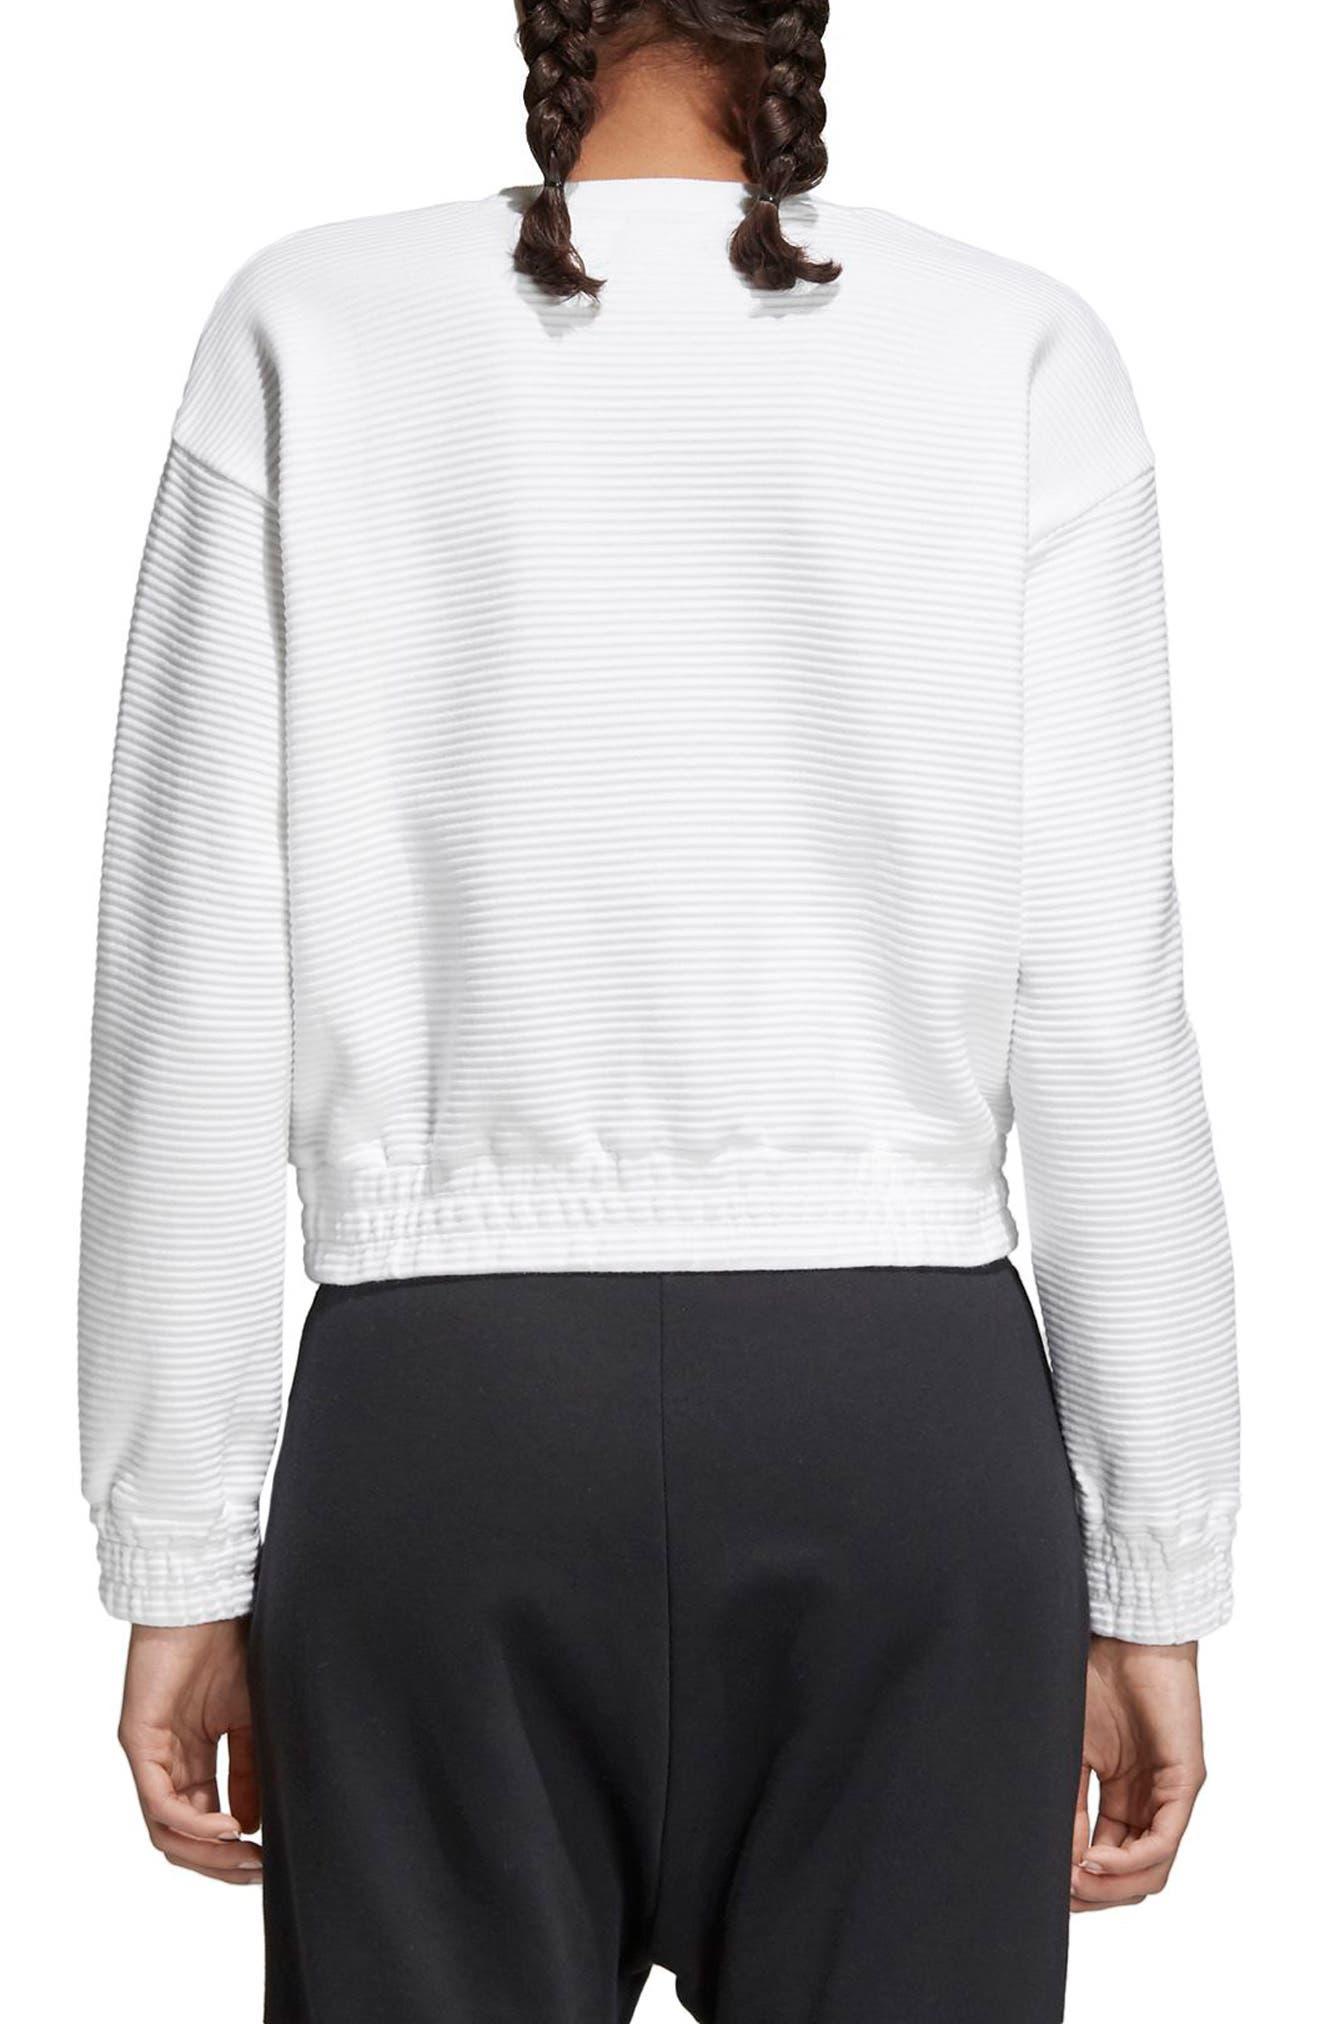 EQT Sweatshirt,                             Alternate thumbnail 2, color,                             White